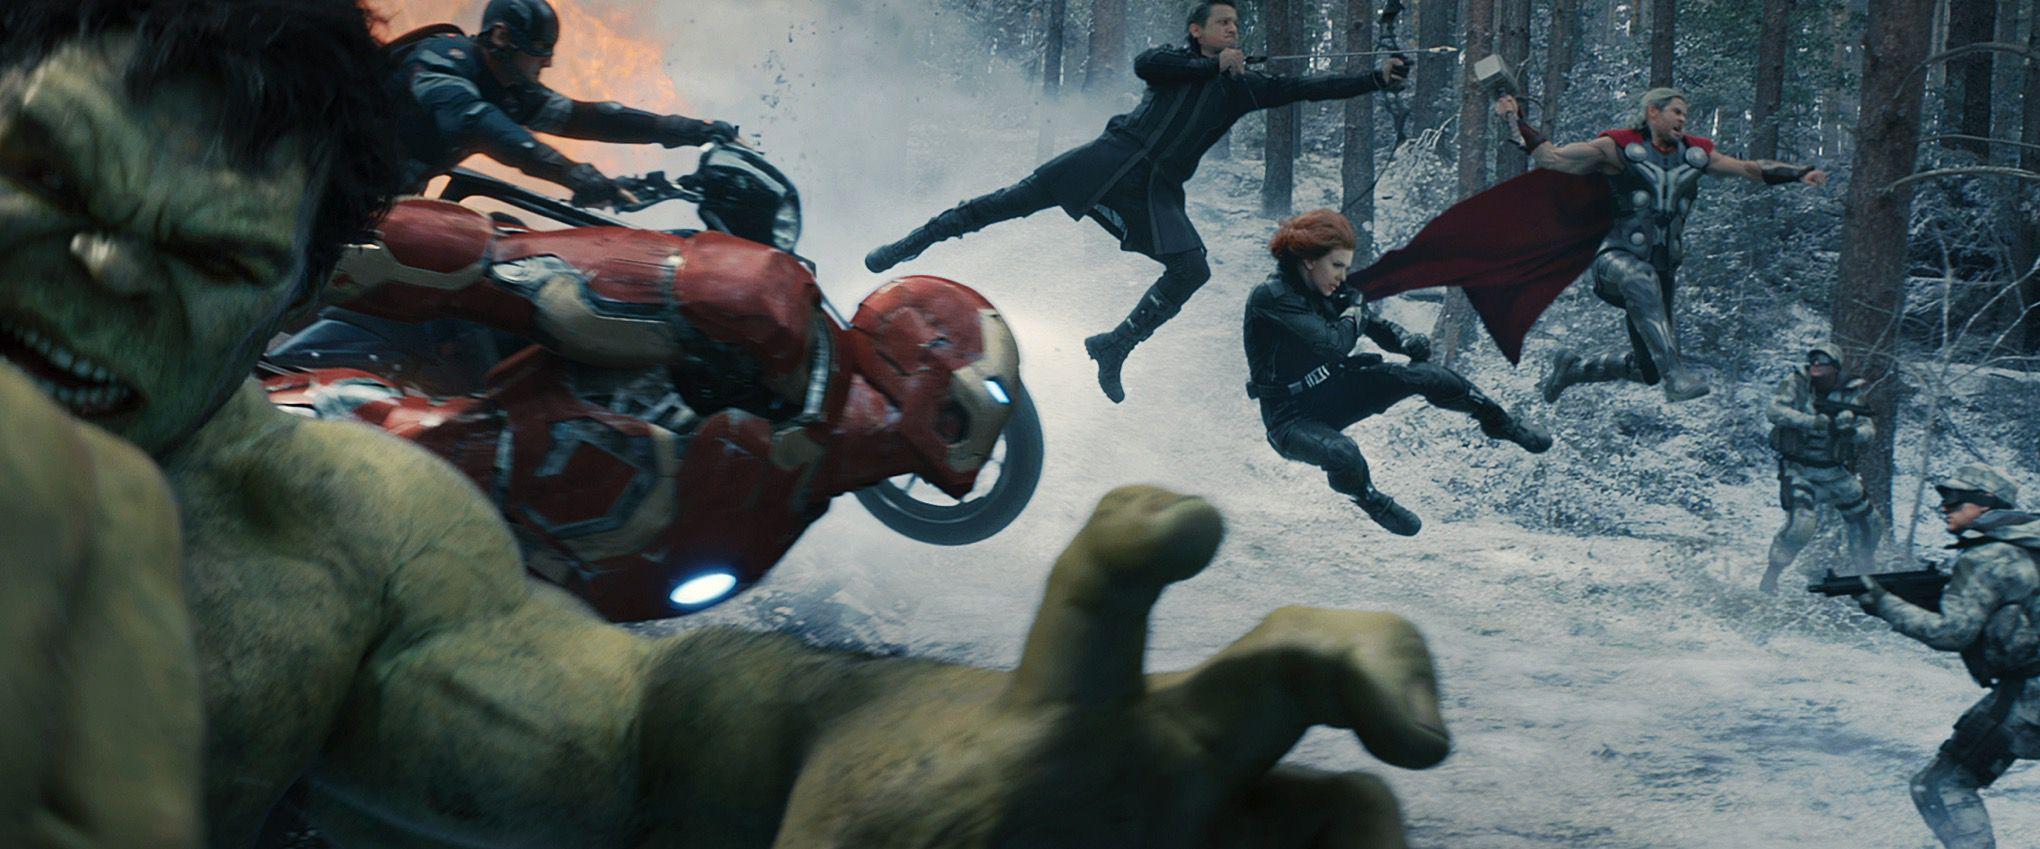 Avengers: Age of Ultron promotional still (MARVEL/DISNEY)